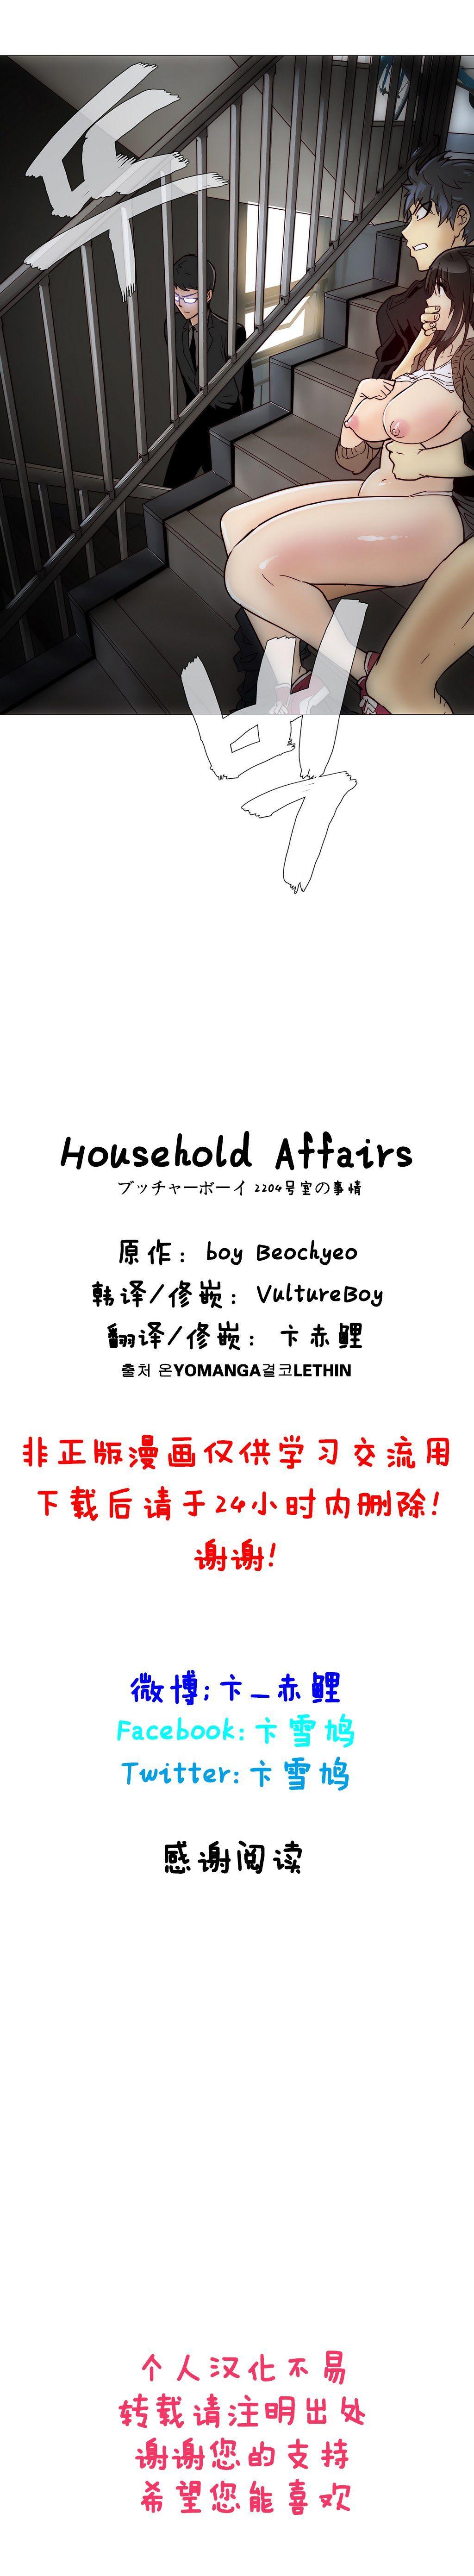 HouseHold Affairs 【卞赤鲤个人汉化】1~33话(持续更新中) 145